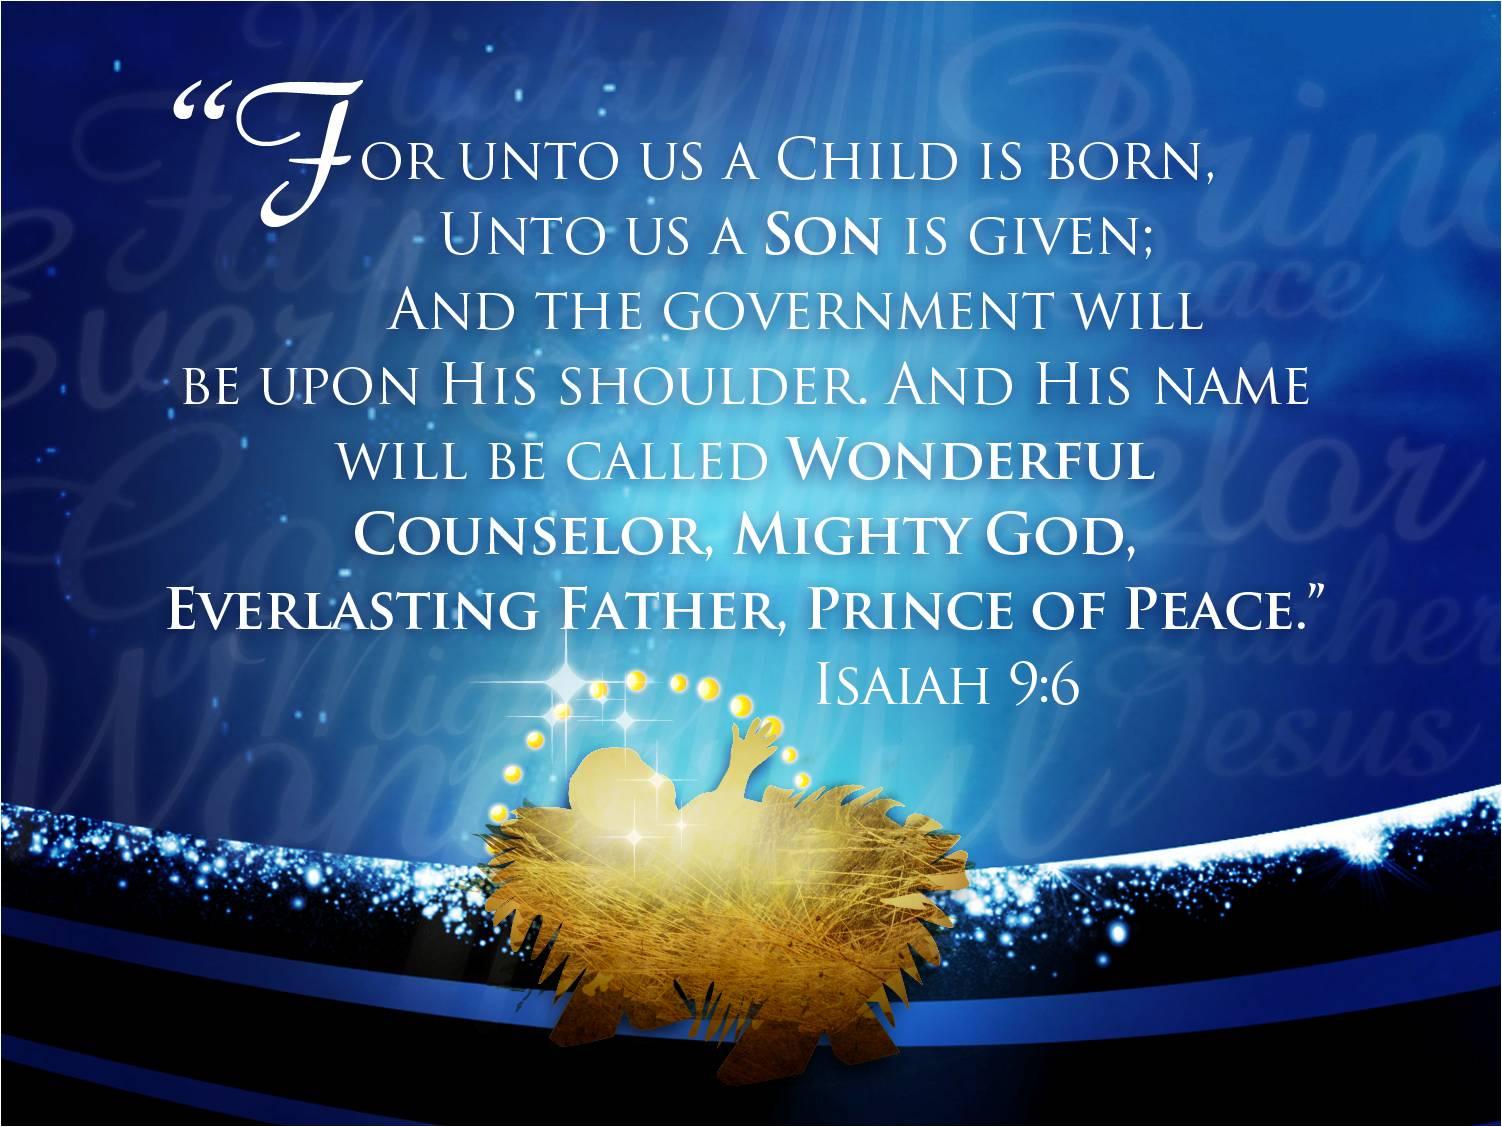 Isaiah-9.6-unto-us-a-child-is-born